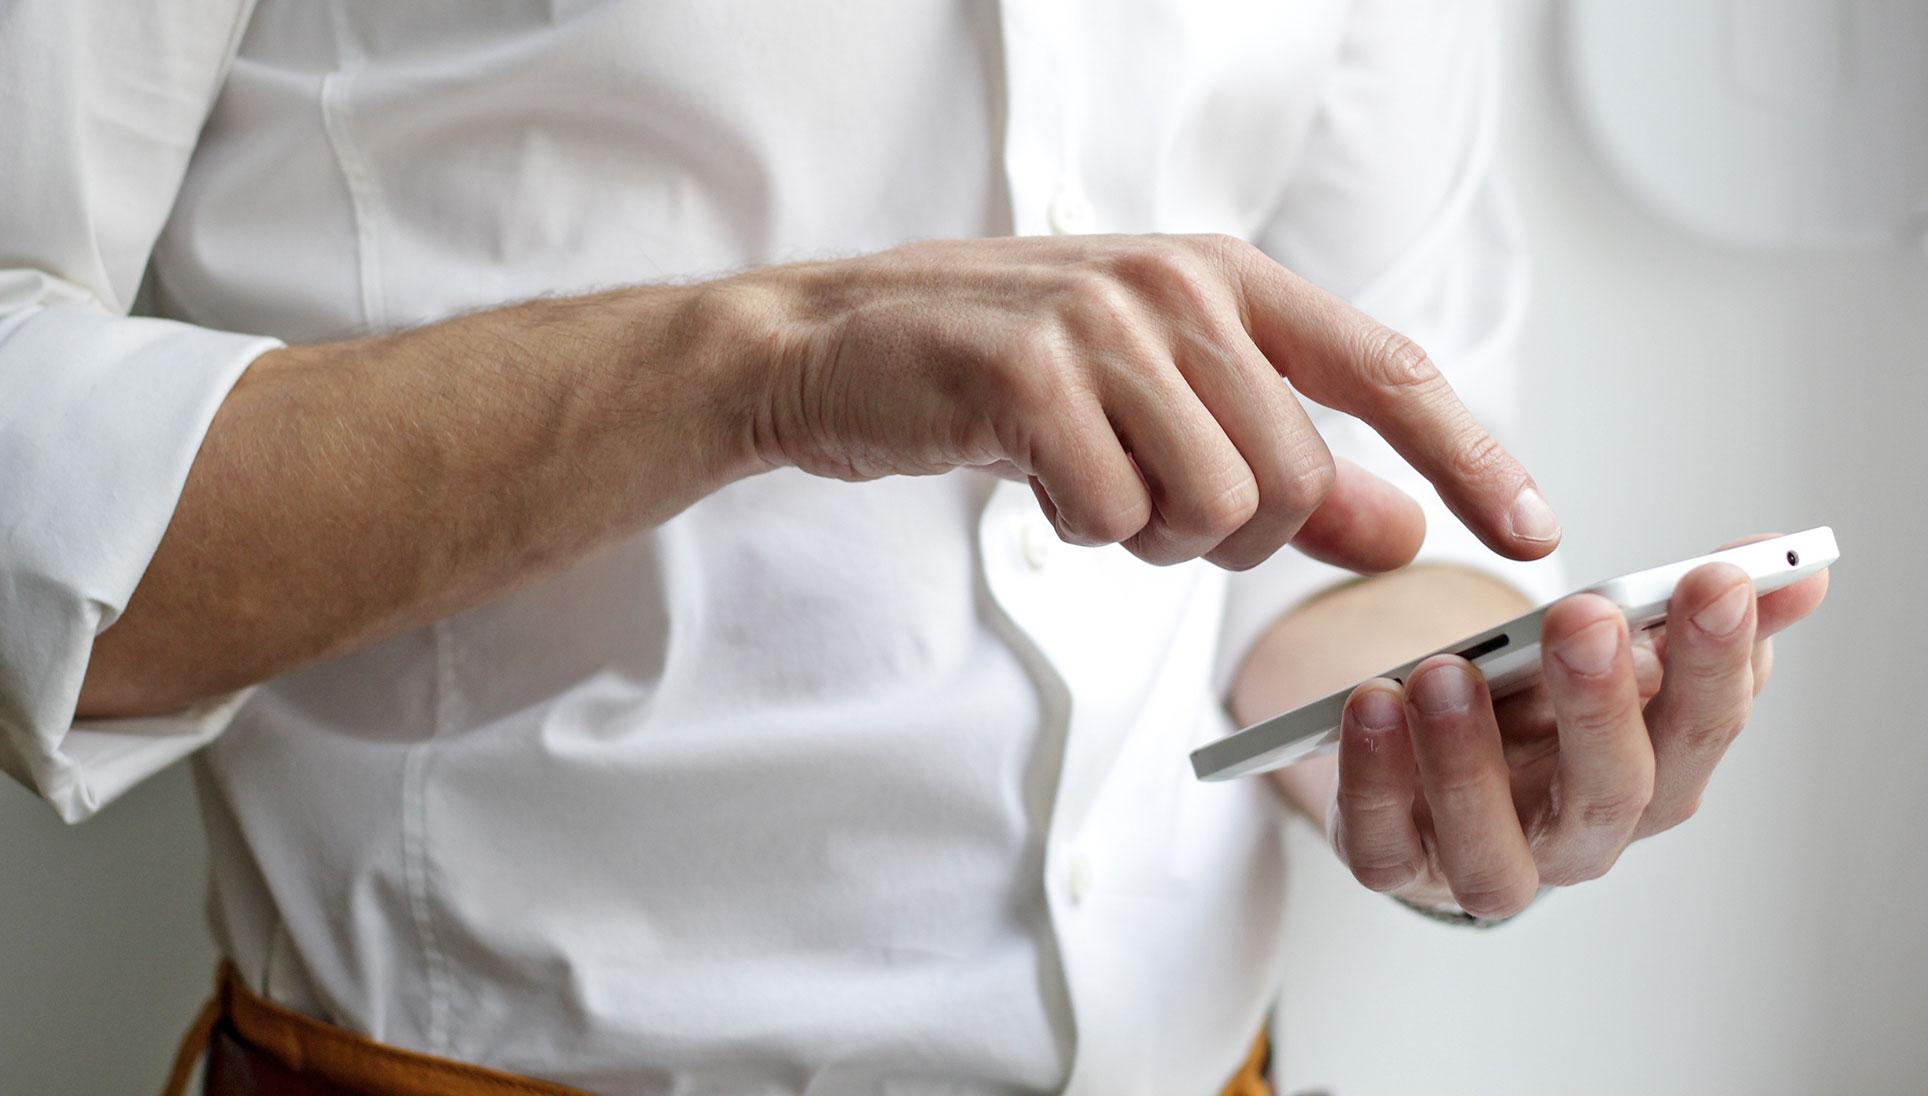 Teacher using Xhibit App on their smartphone